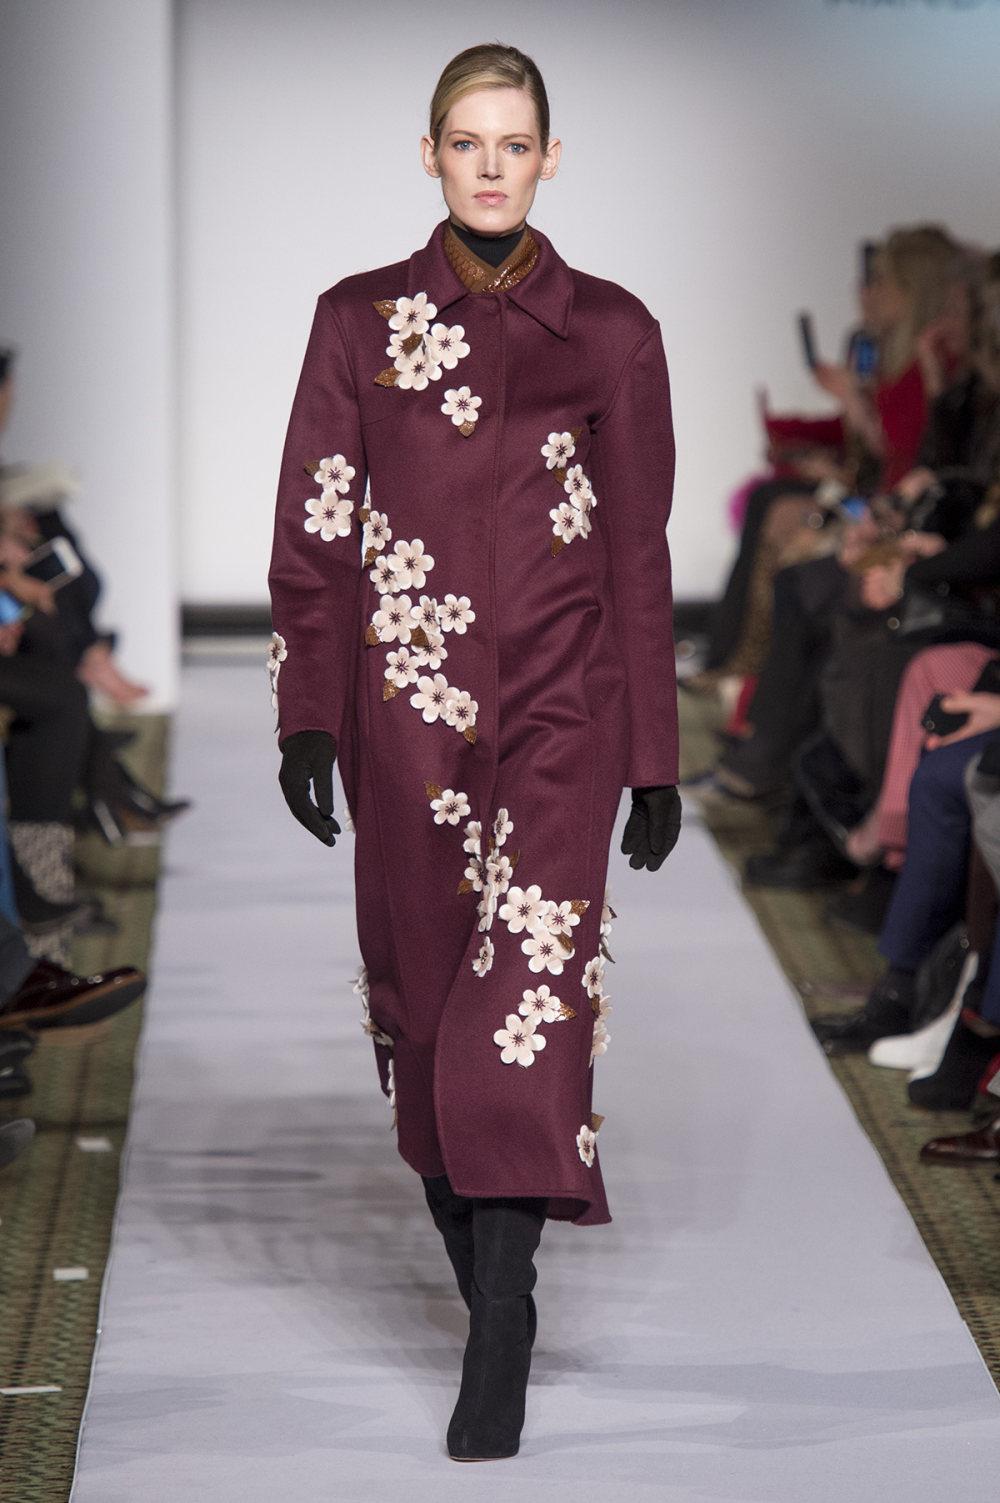 Carolina Herrera时装系列用鲜艳的颜色充满智能的黑白色调-32.jpg